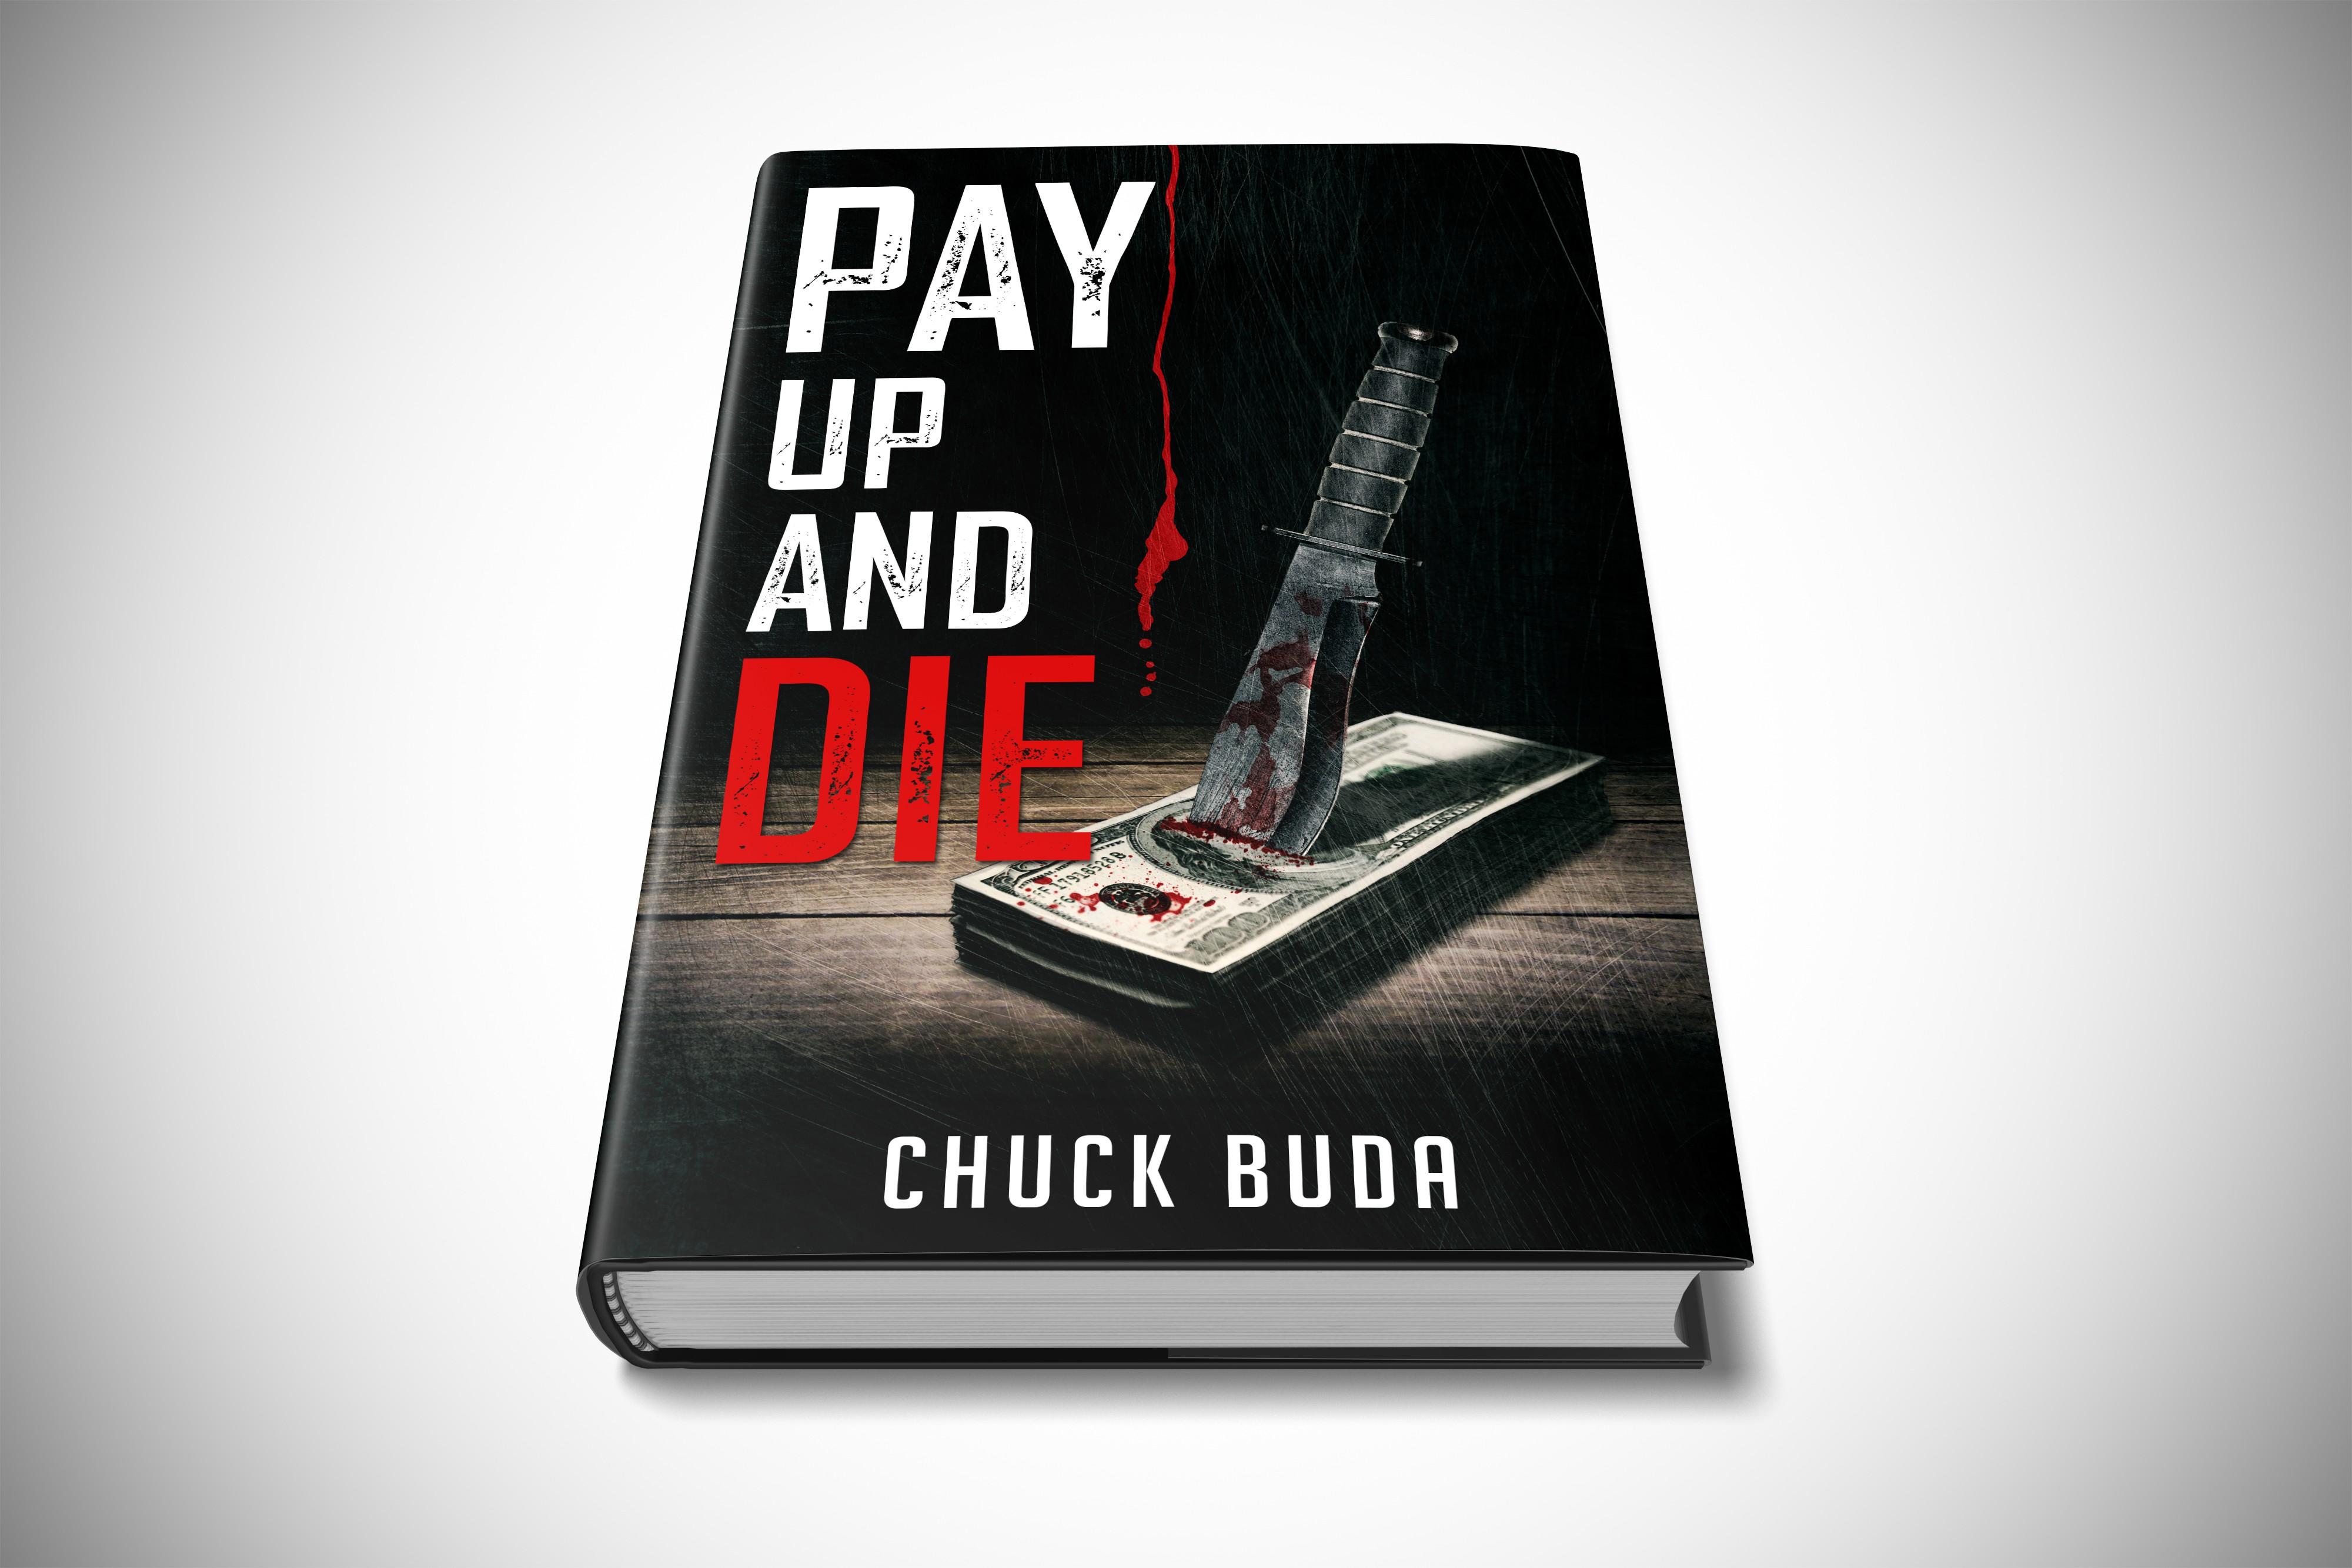 Create a killer cover for a dark, psychological thriller novel